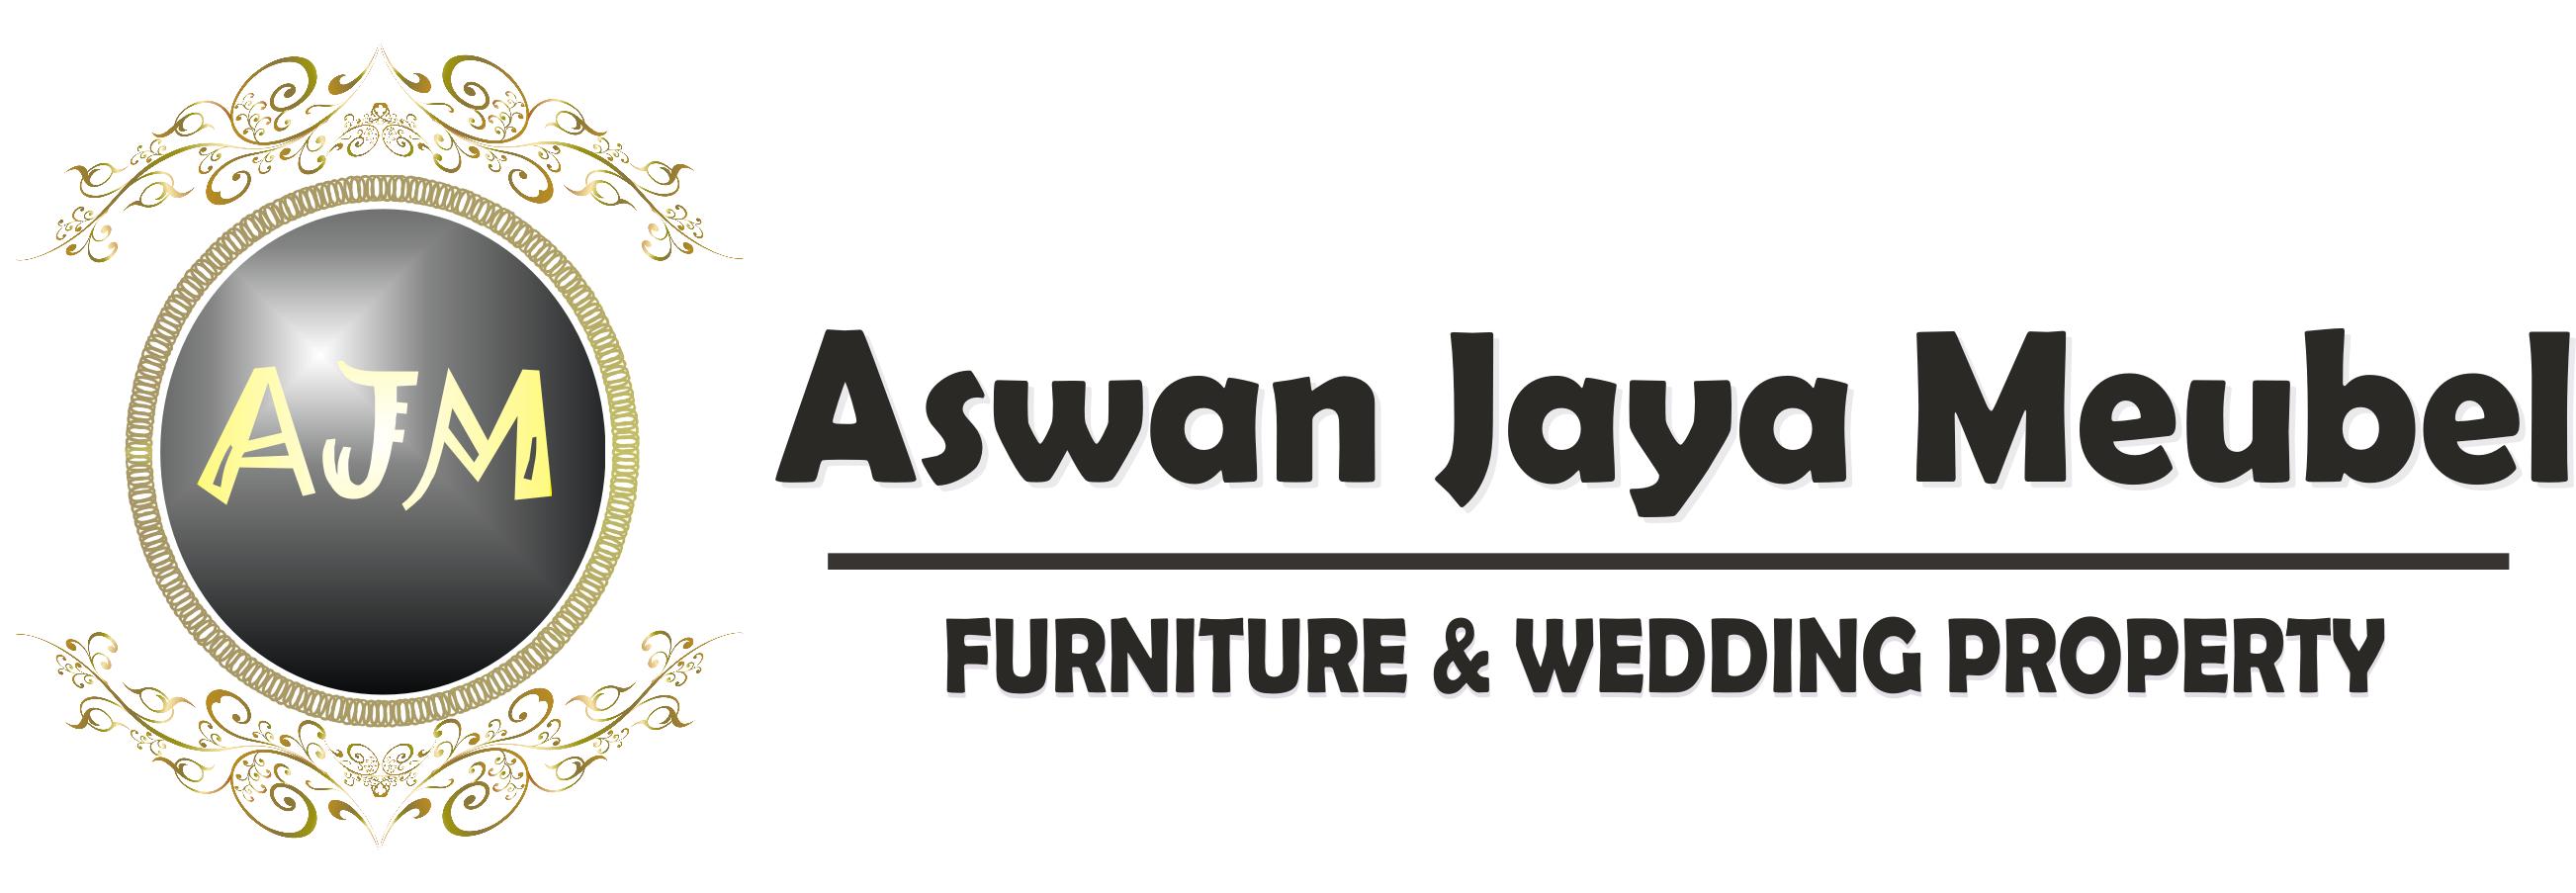 Aswan Jaya Meubel